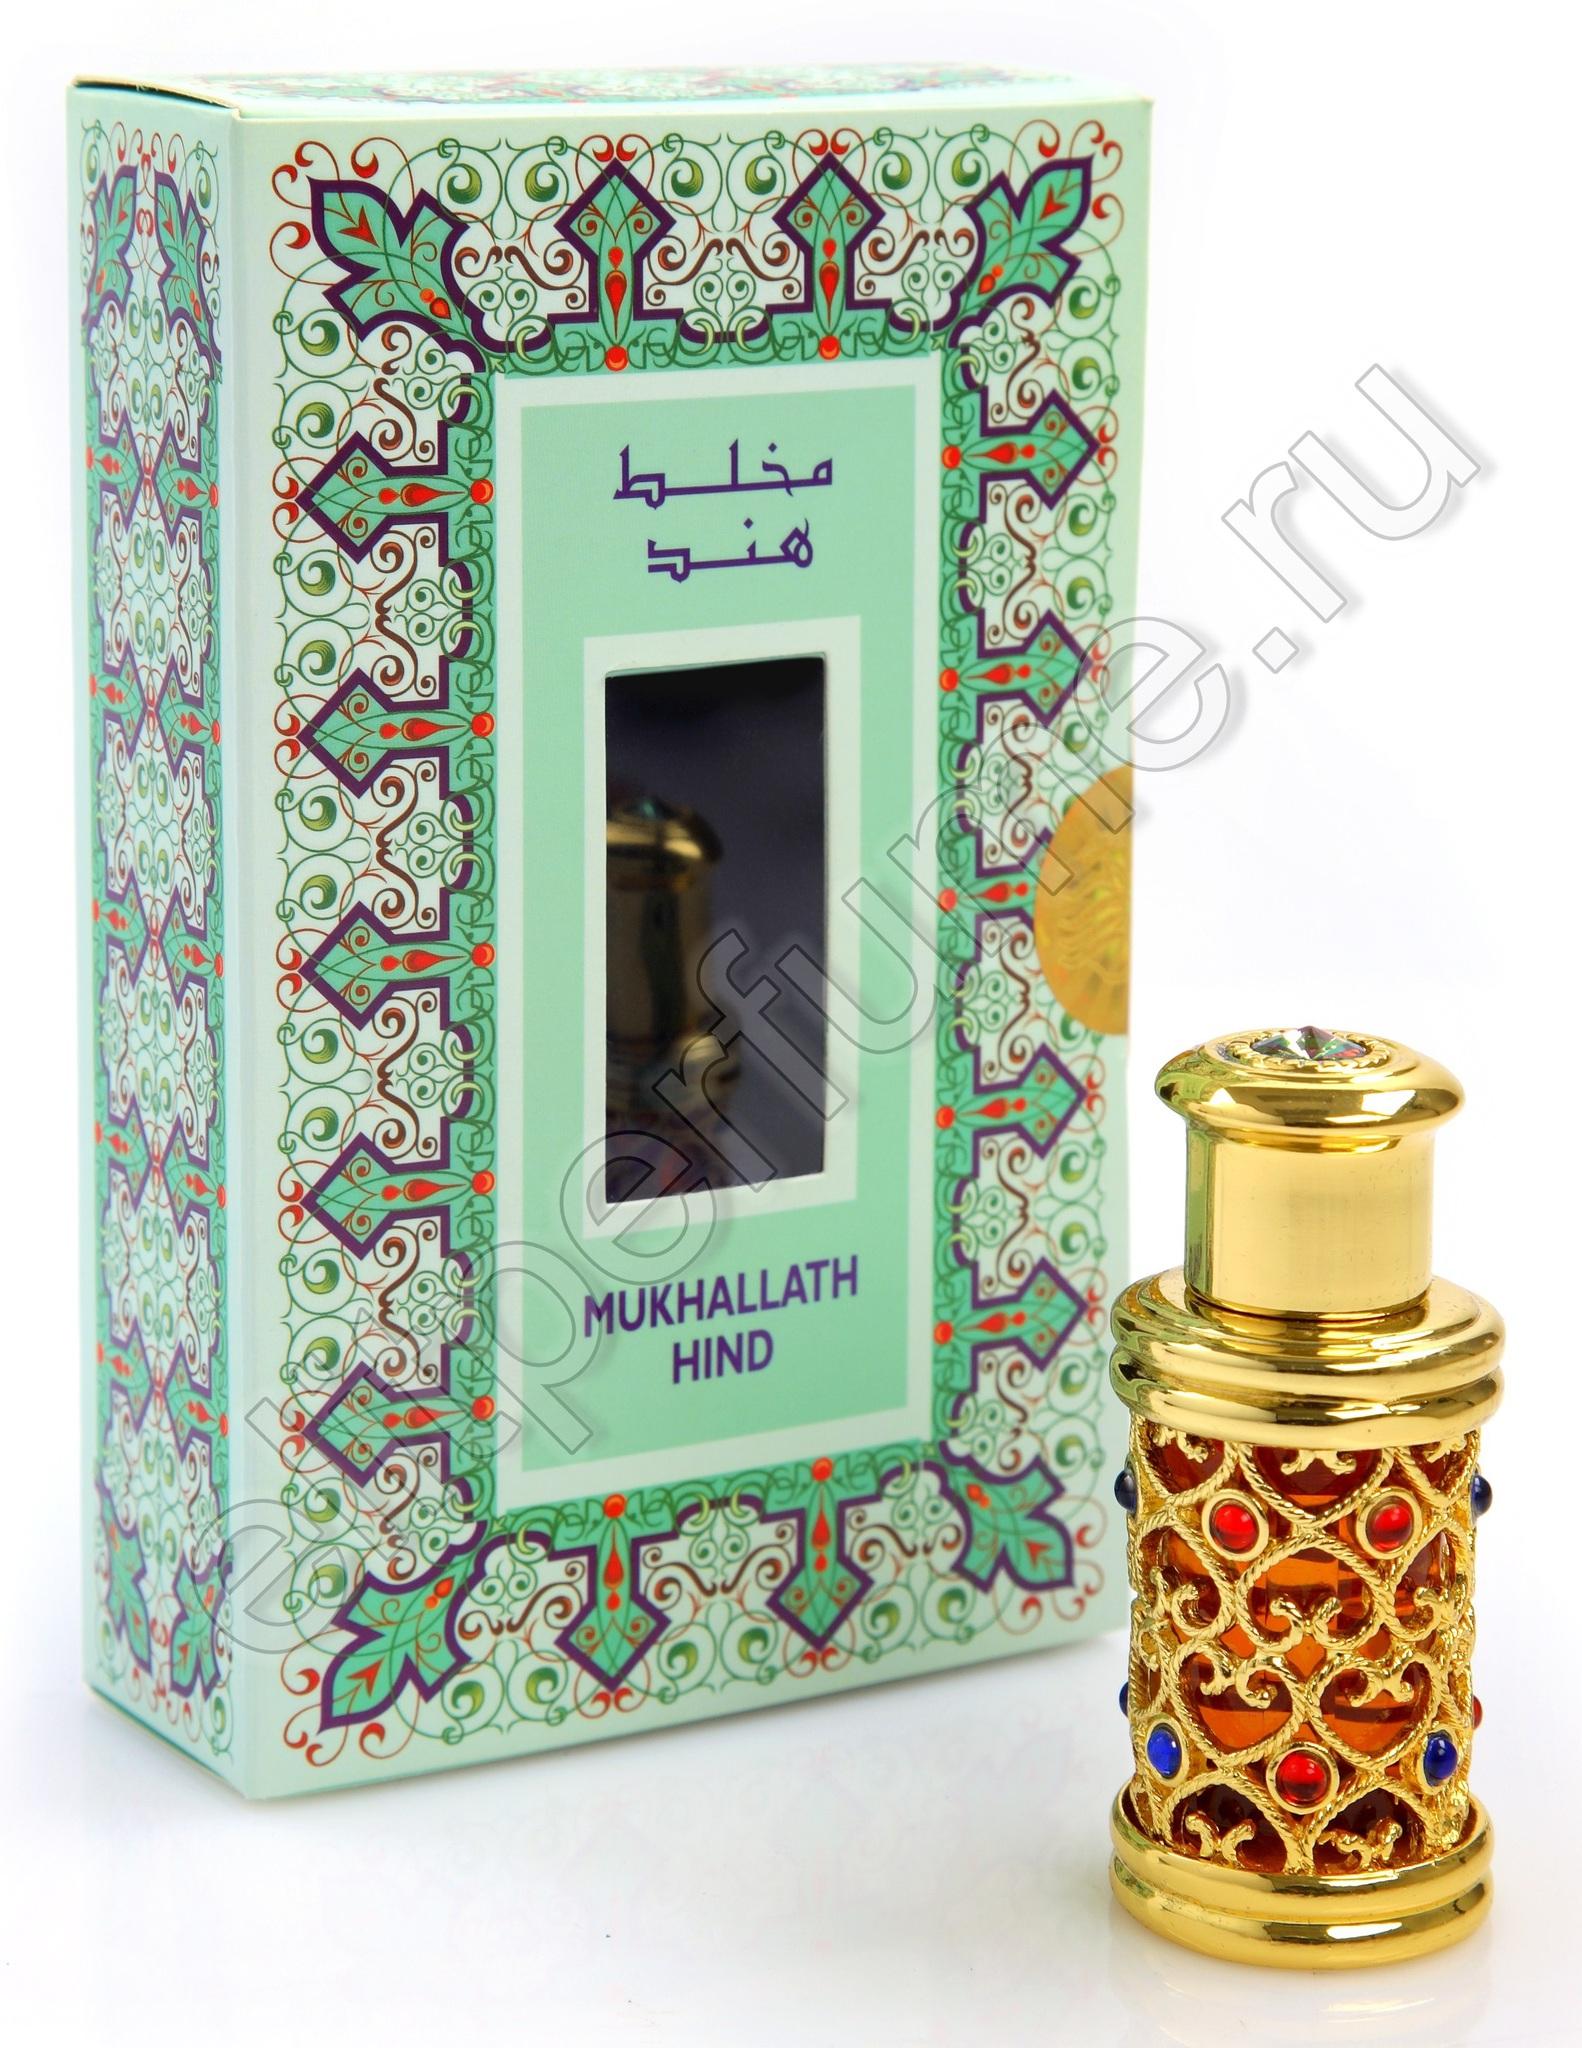 Пробники для Мухаллат Хинд Mukhallath Hind 1 мл арабские масляные духи от Аль Харамайн Al Haramin Perfumes